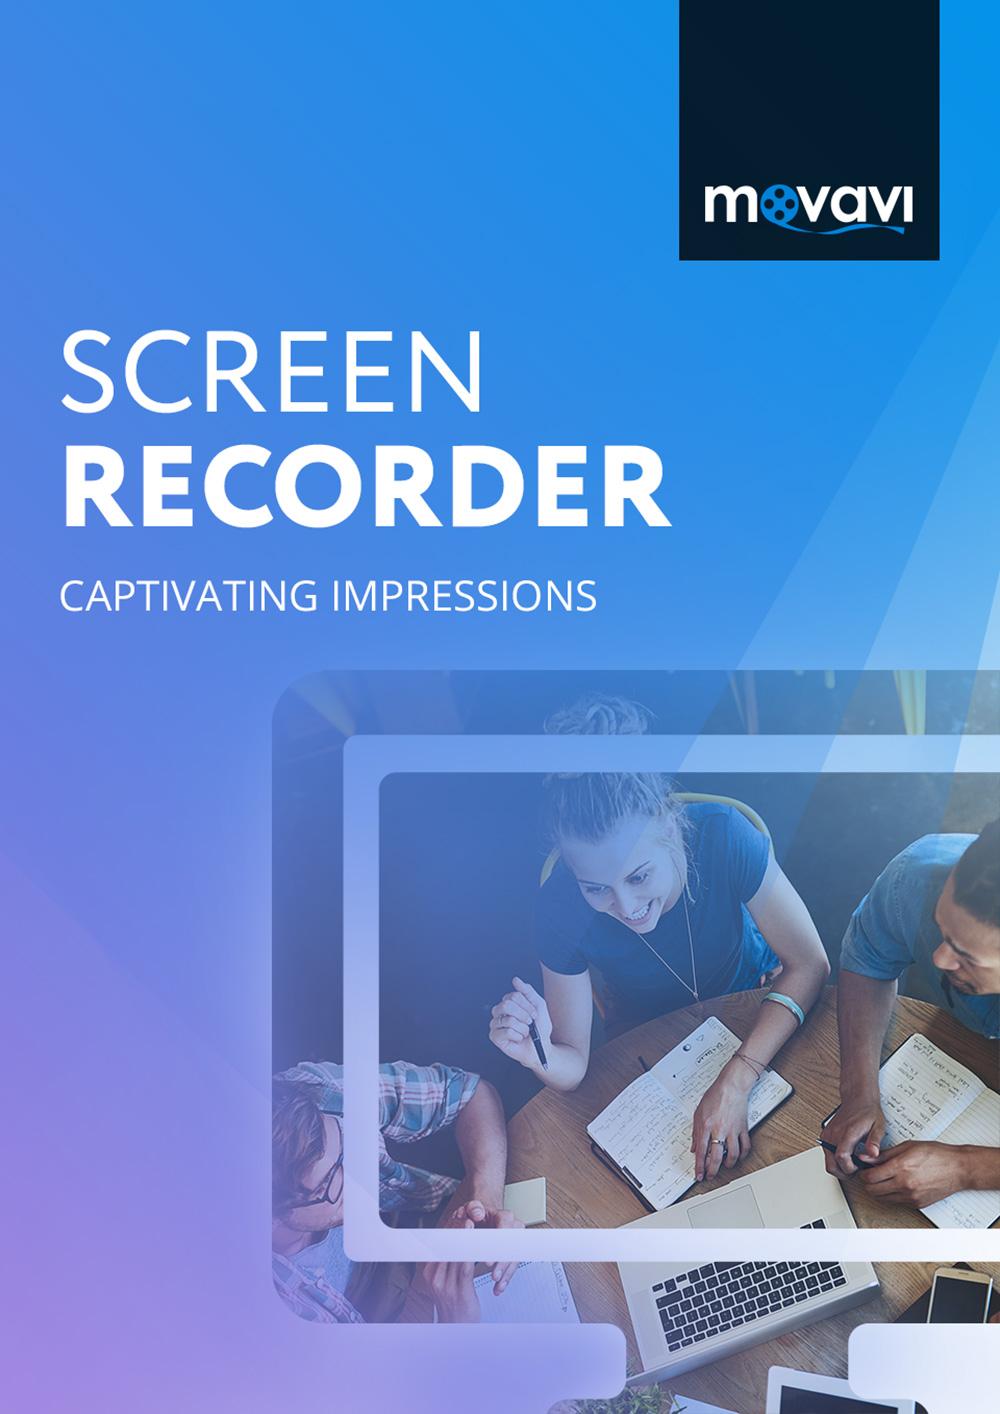 Movavi Screen Recorder 9 Home Edition [Download] by Movavi